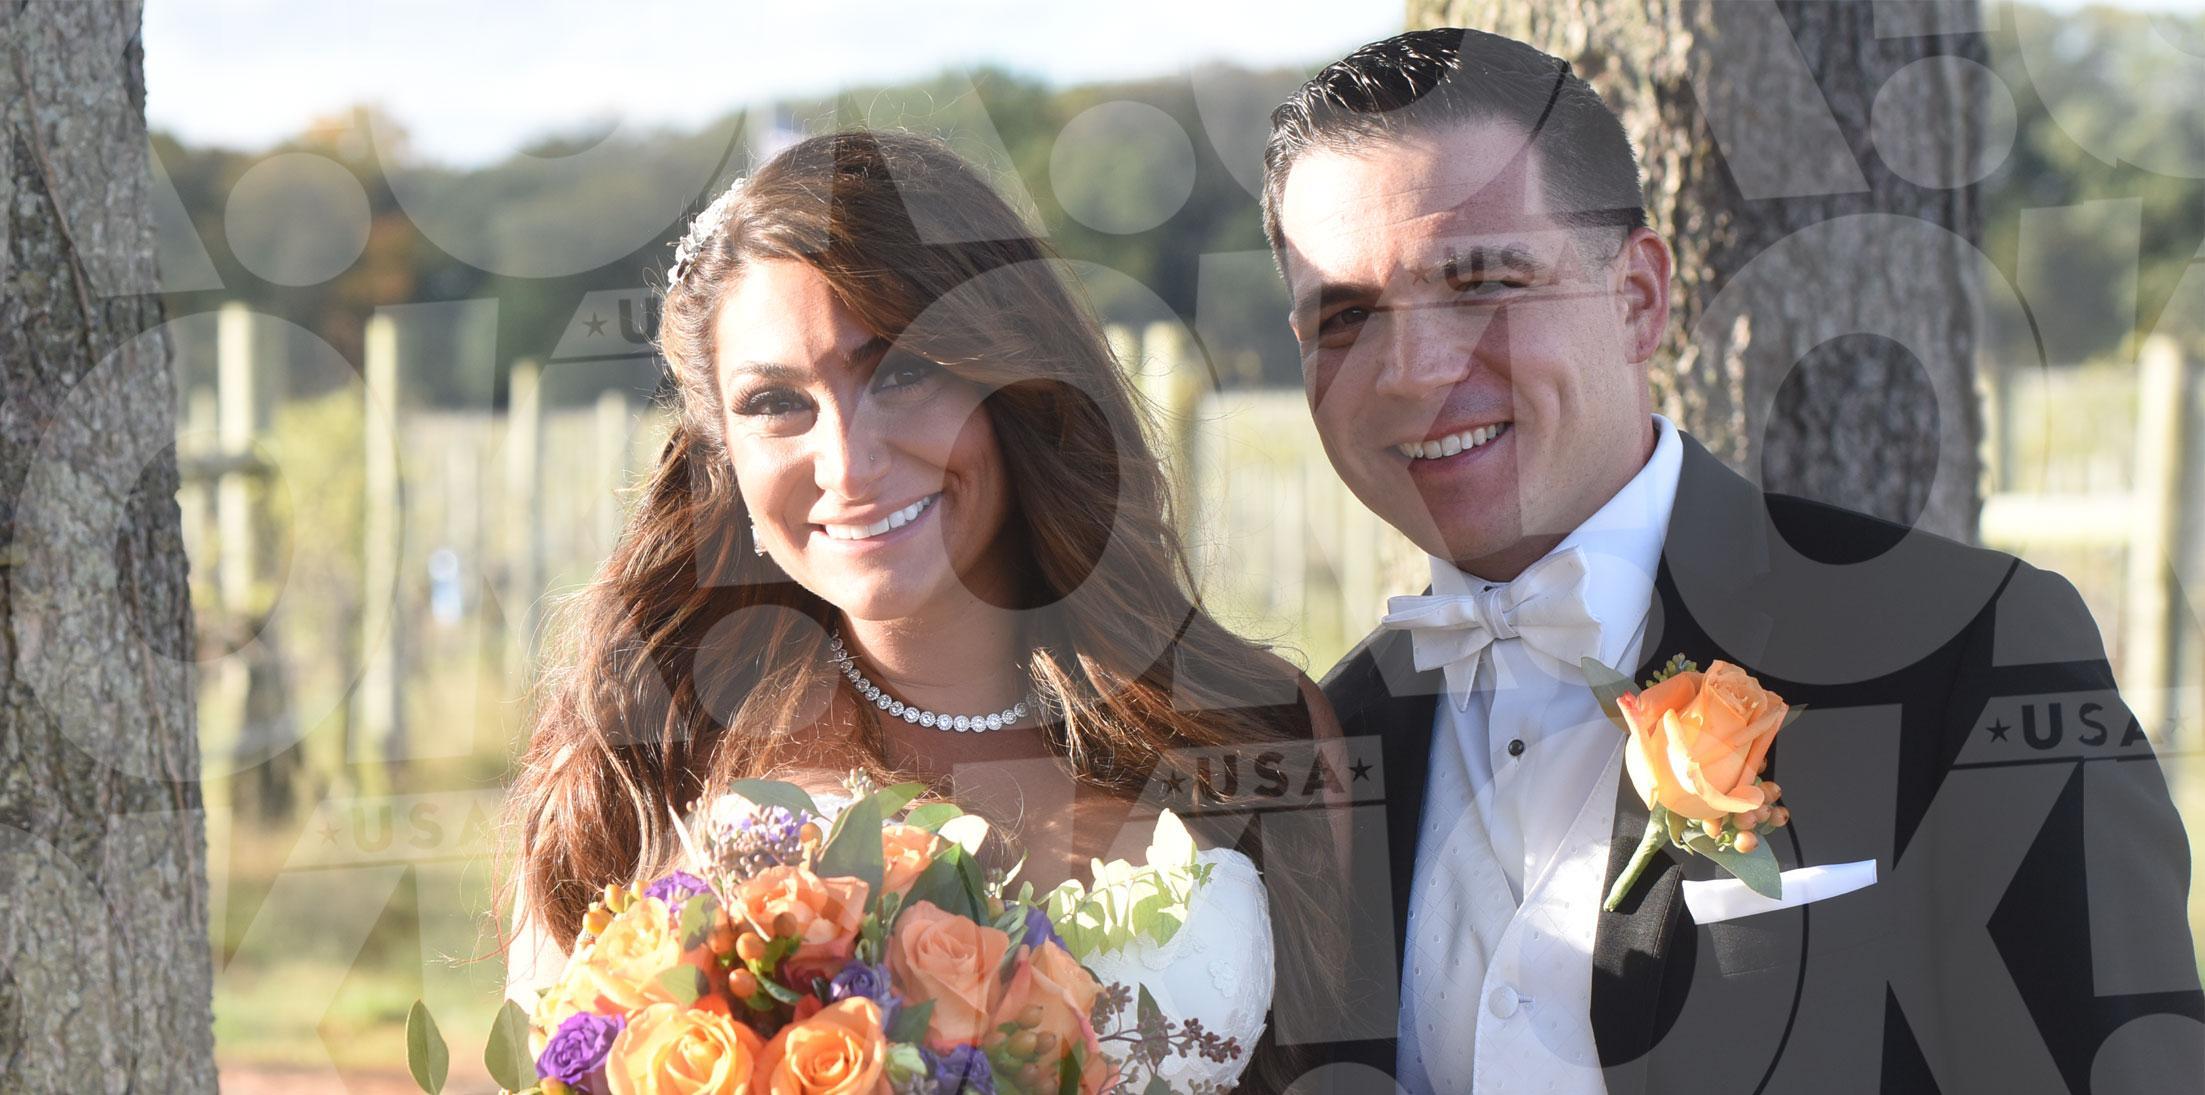 deena cortese wedding pics rustic fall theme hero